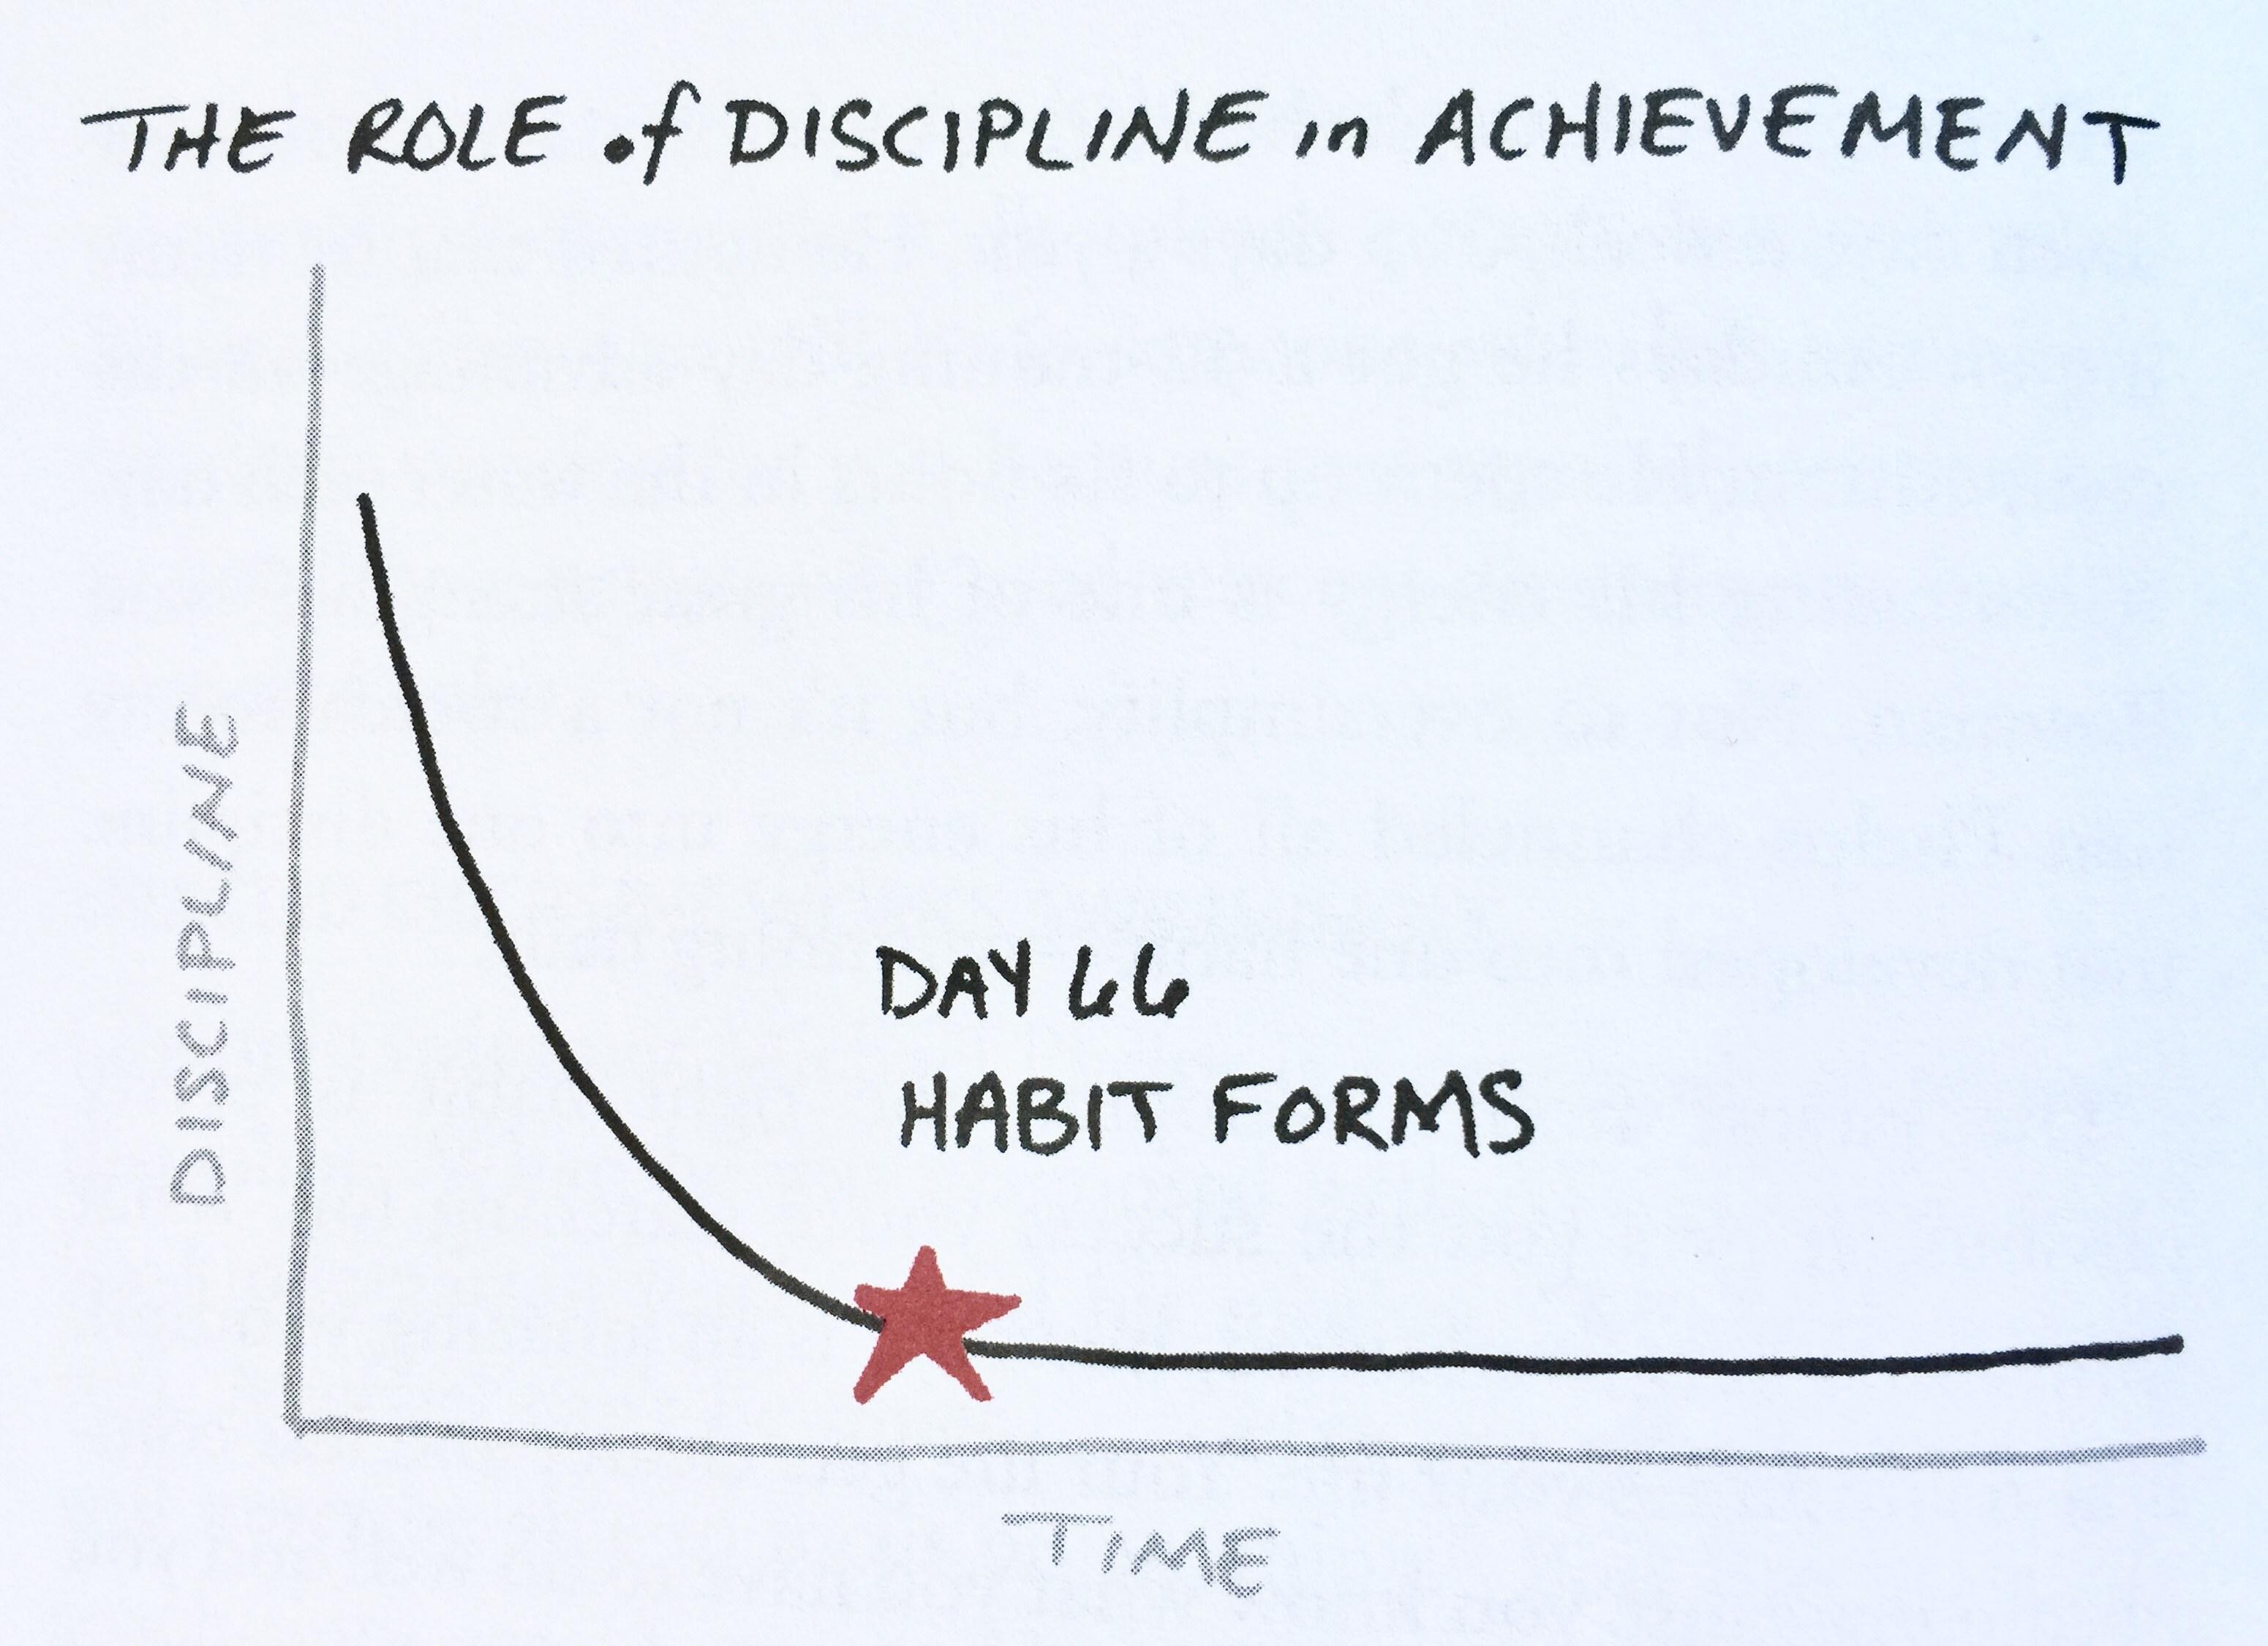 Figure 1: Discipline of Habit Formation